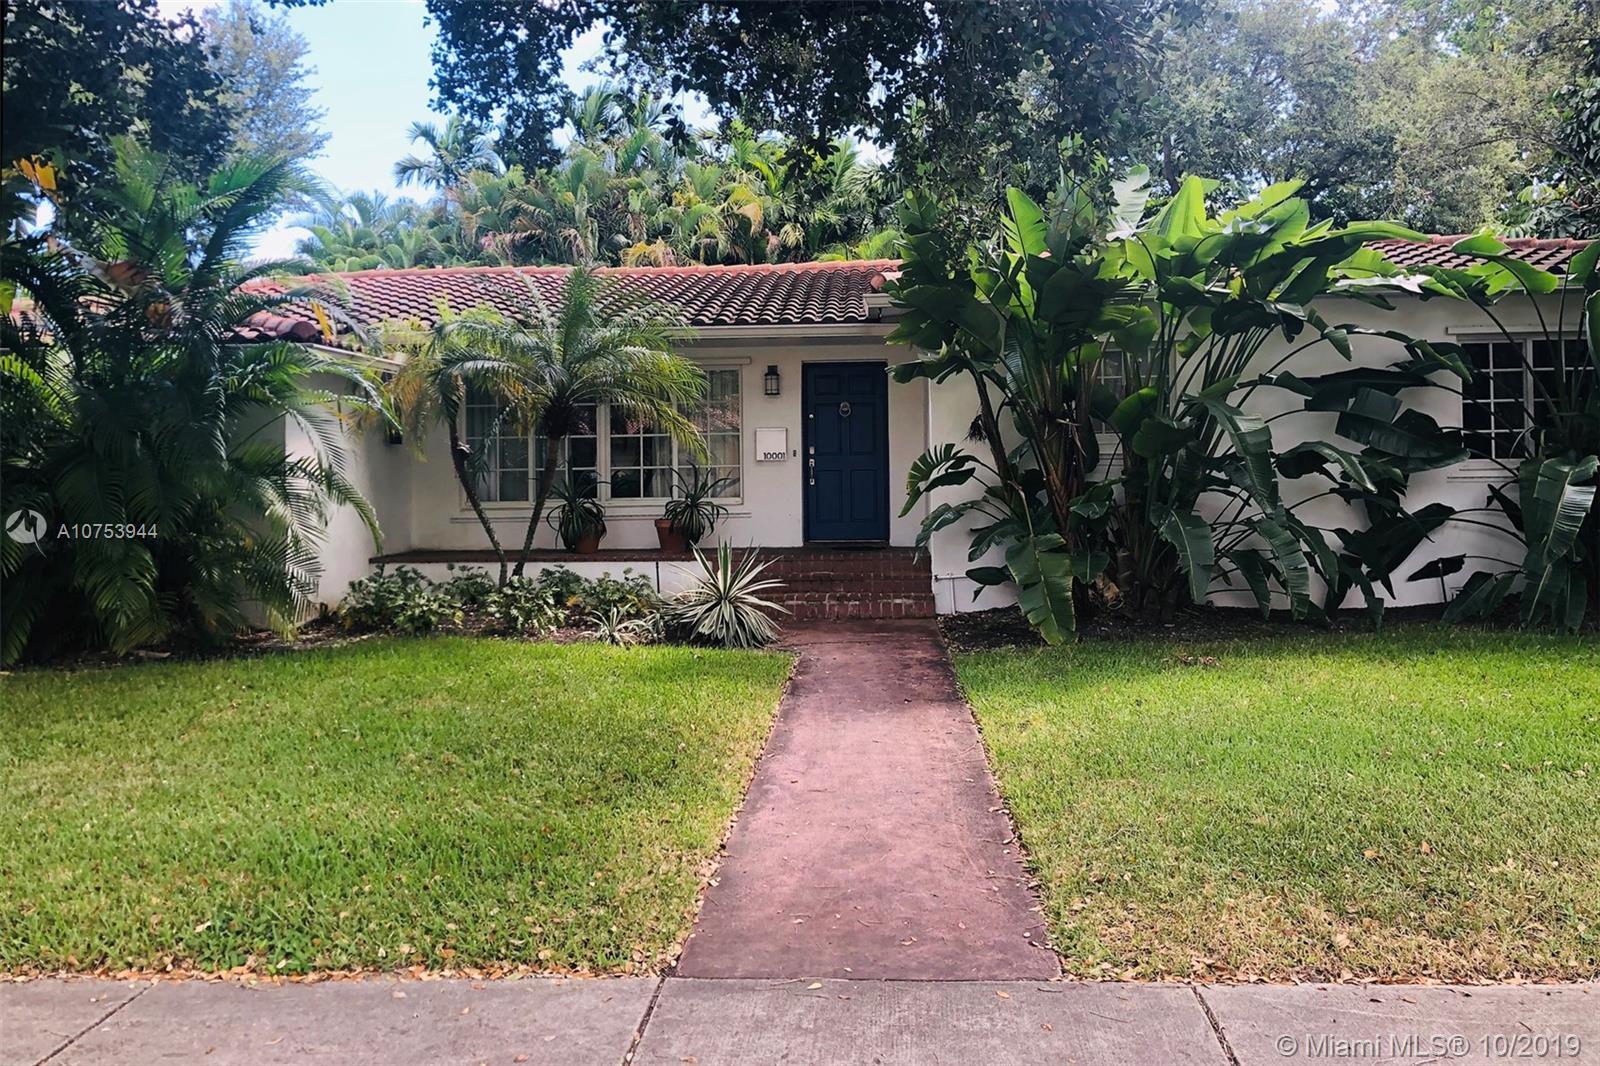 10001 NE 1st Ave, Miami Shores, FL, 33138